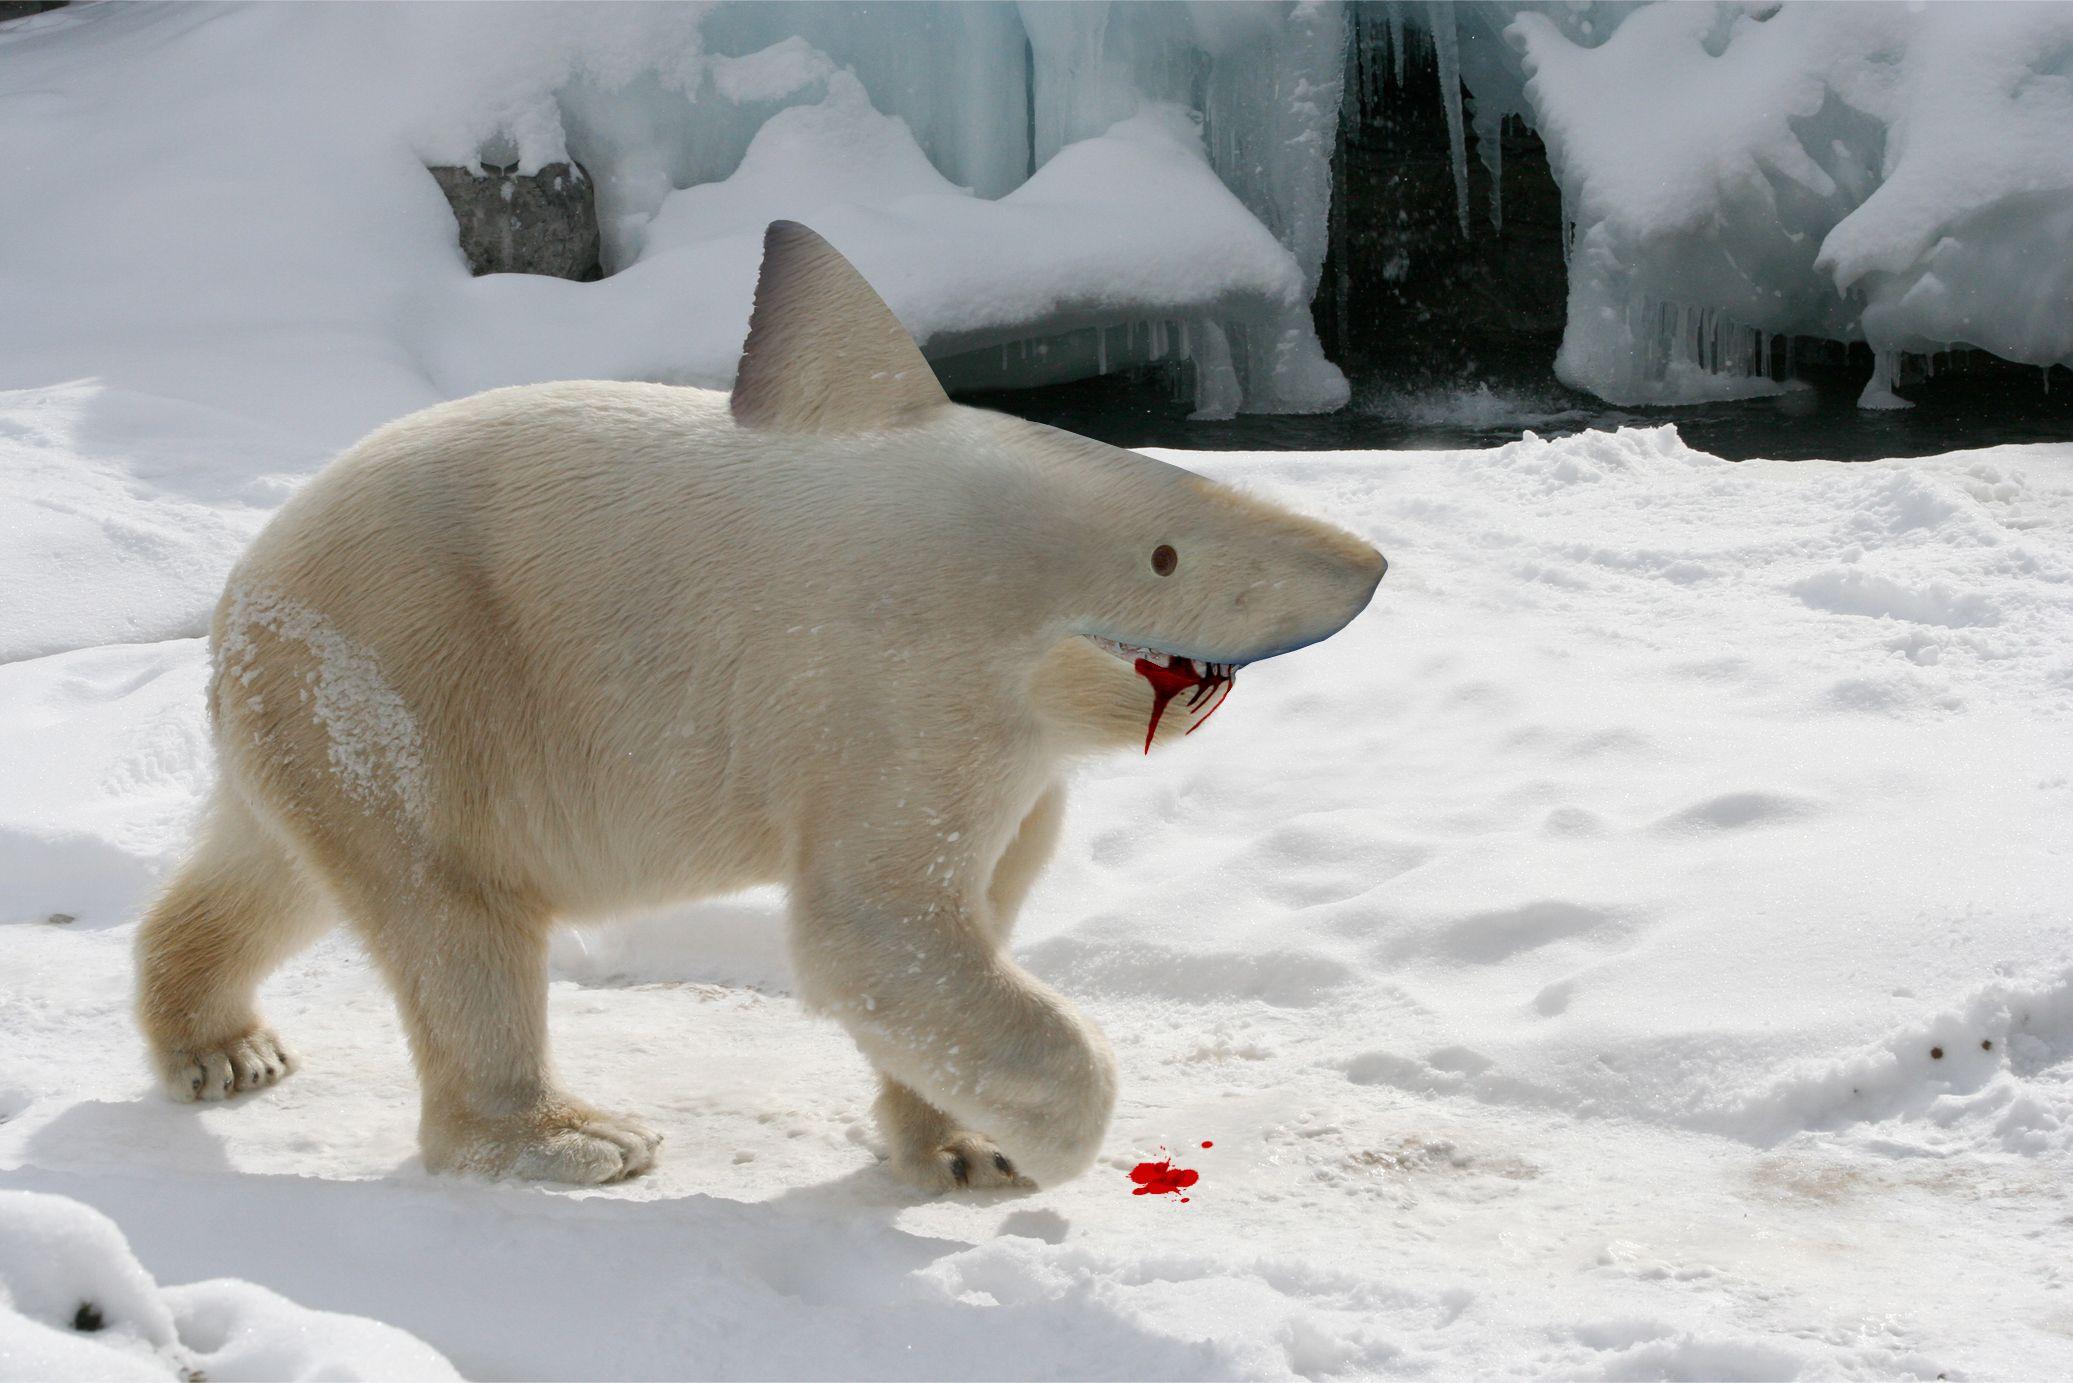 A baby bear-shark? #GraphicDesign #Photoshop | G R A P H I ...